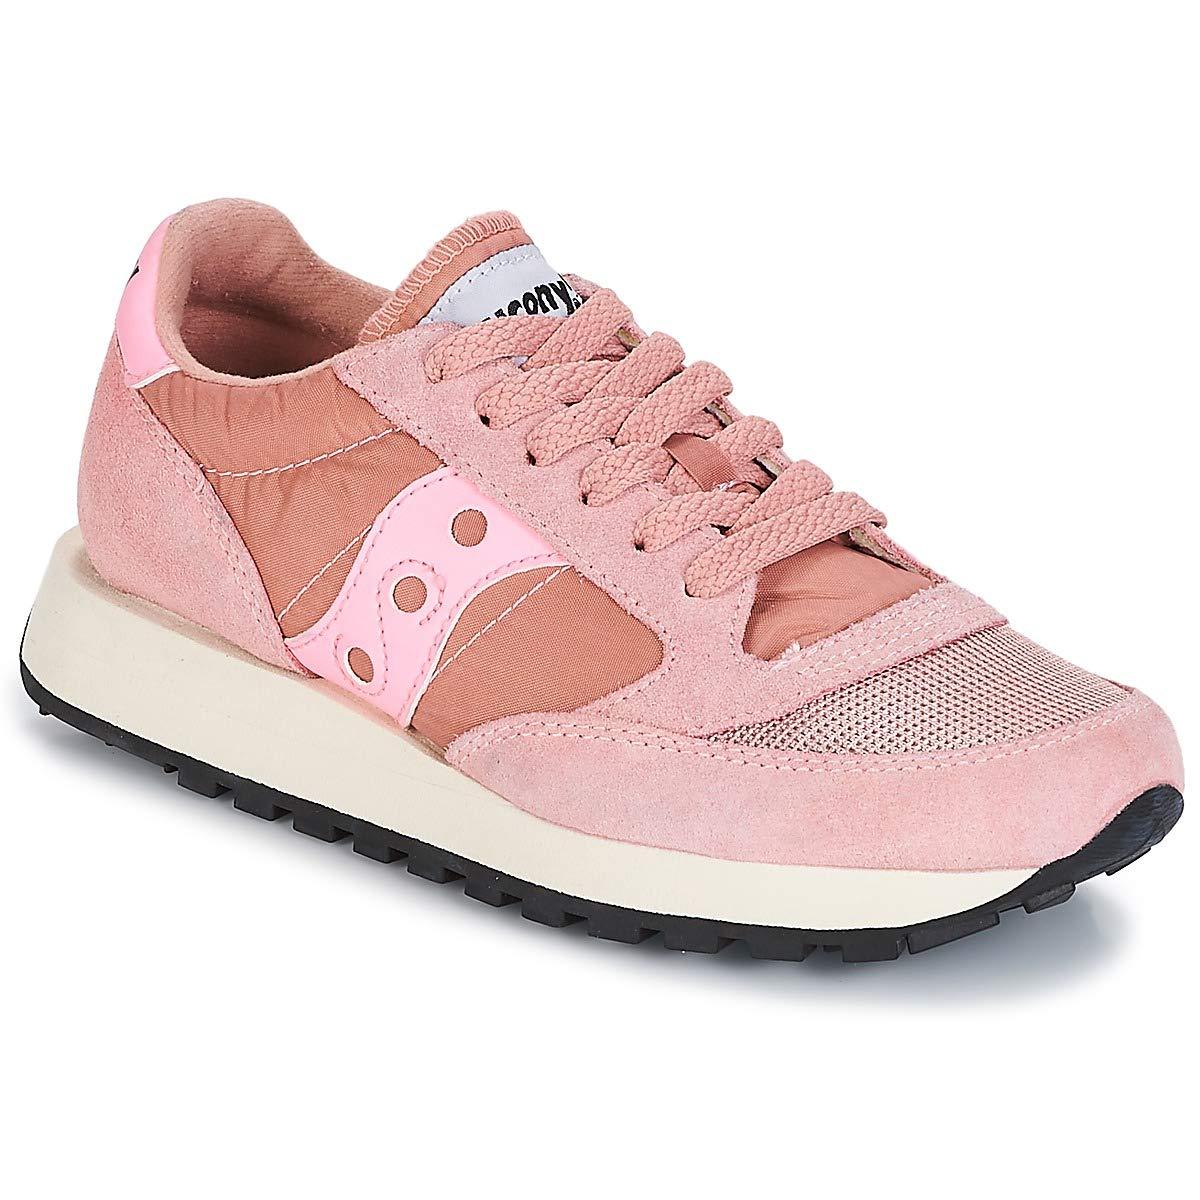 Sneaker Saucony Jazz Original Vintage Pink 32 Rosso: Amazon